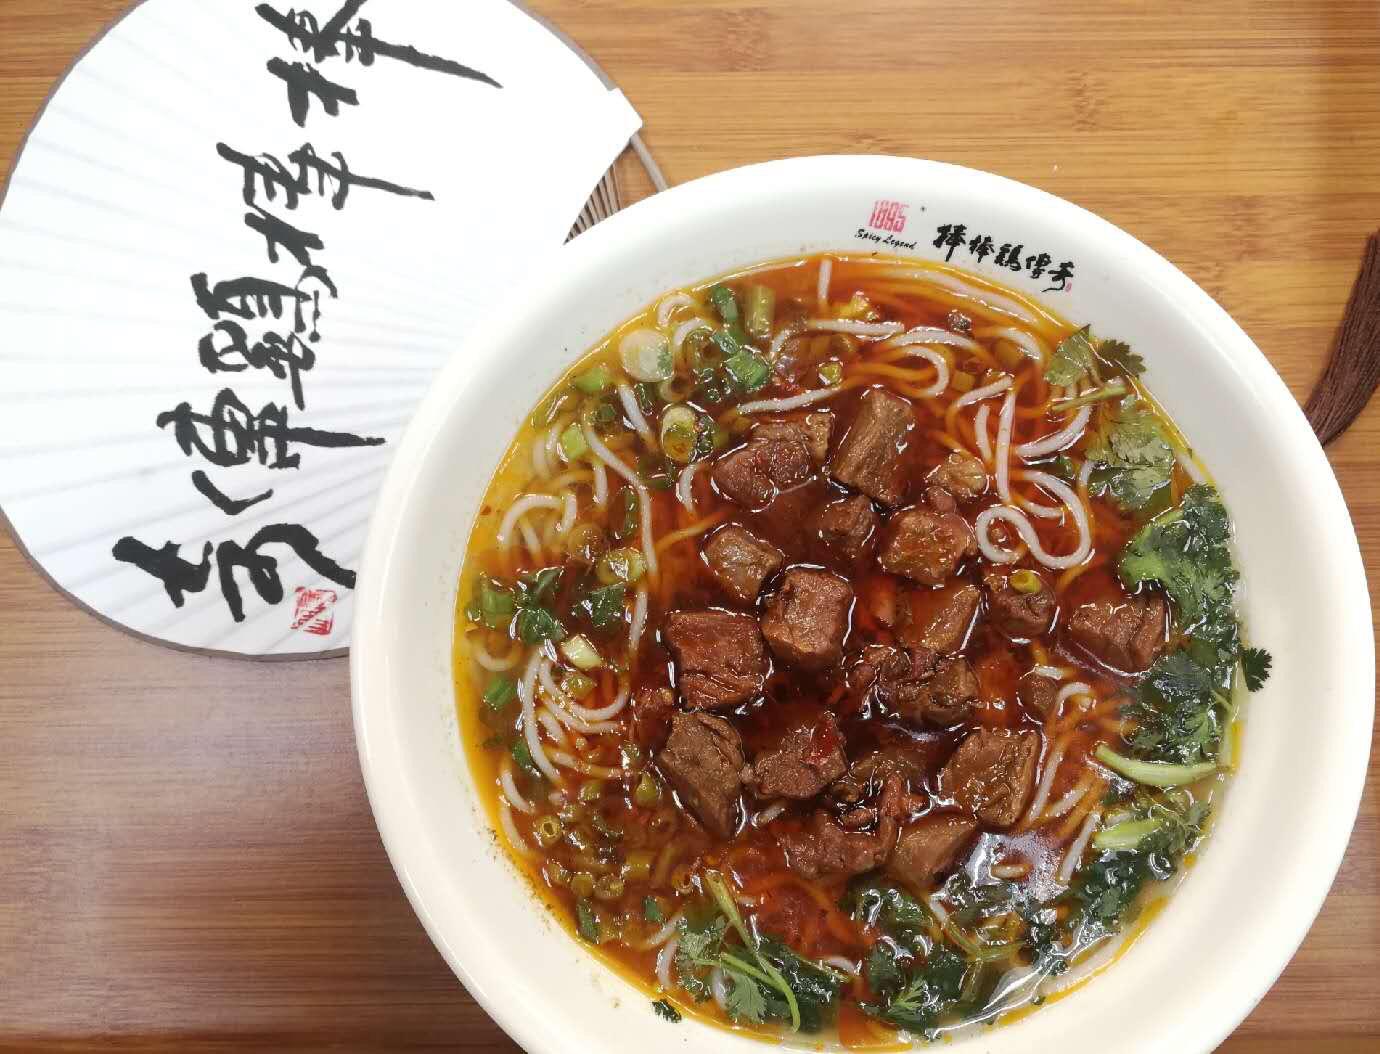 BBJ【棒棒鸡传奇】四川风味红烧牛肉米线 Rice Vermicelli Soup with Sichuan Style Braised Beef